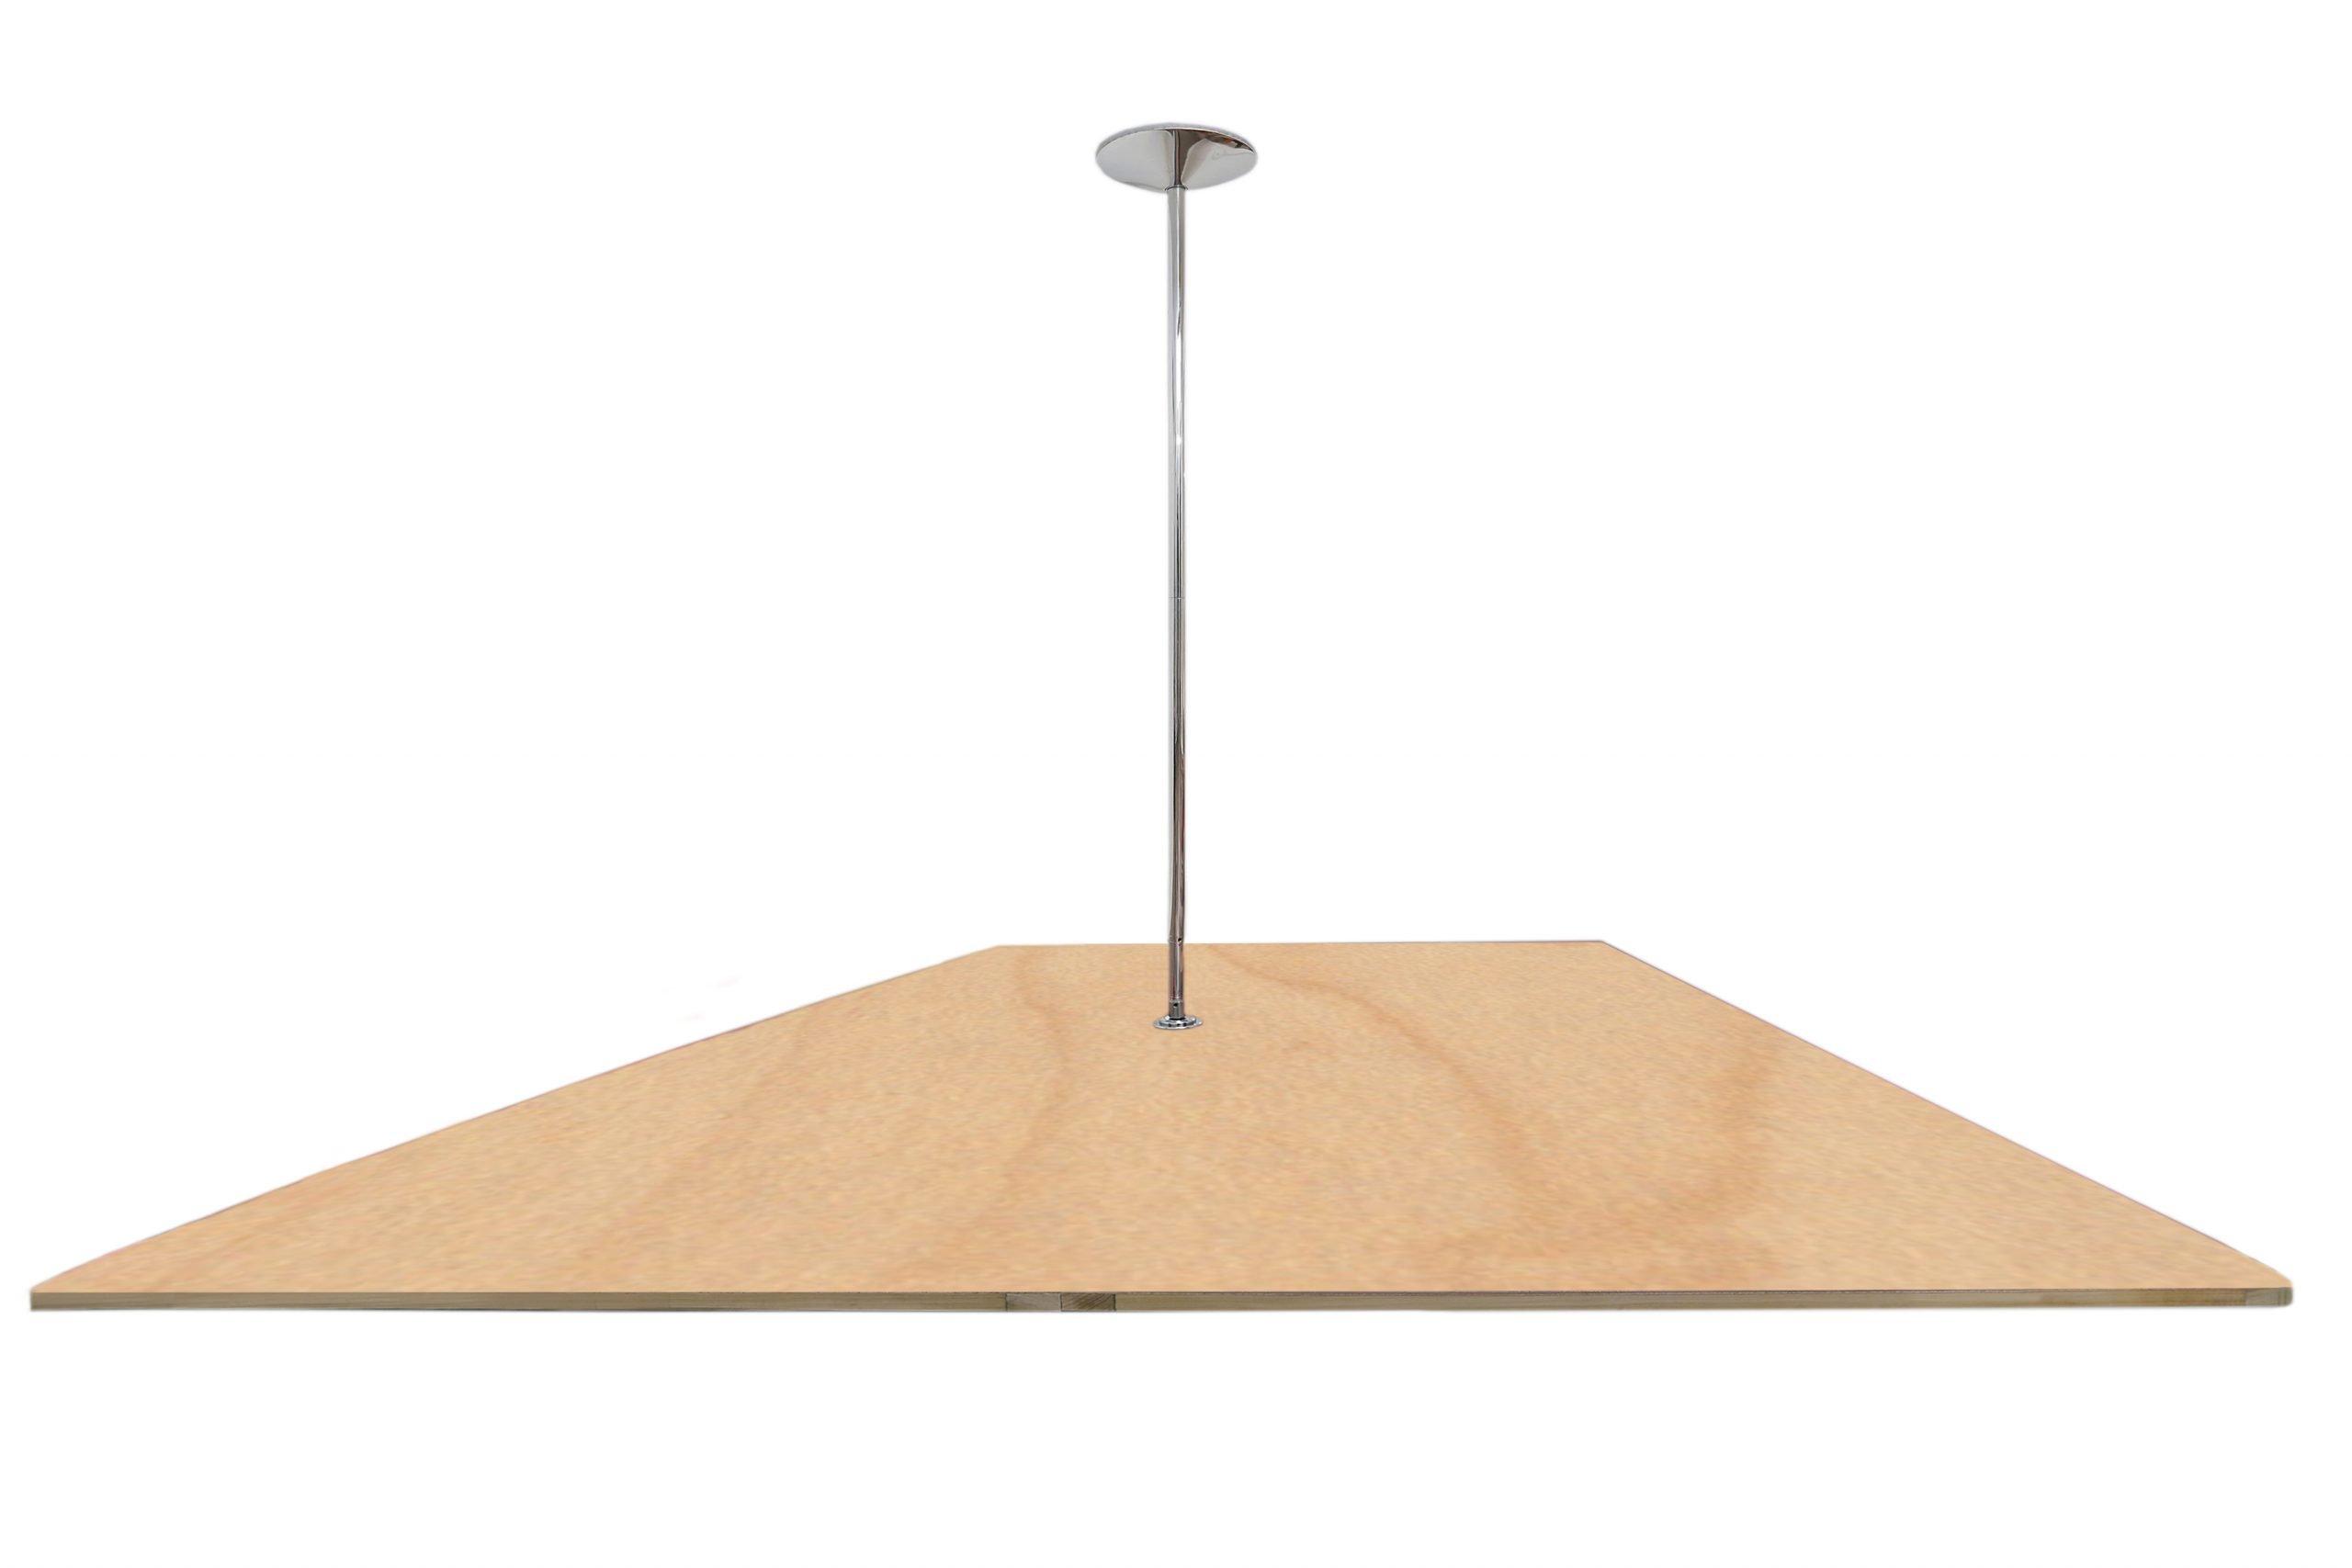 Pole Dance Floor Wood finish Maple